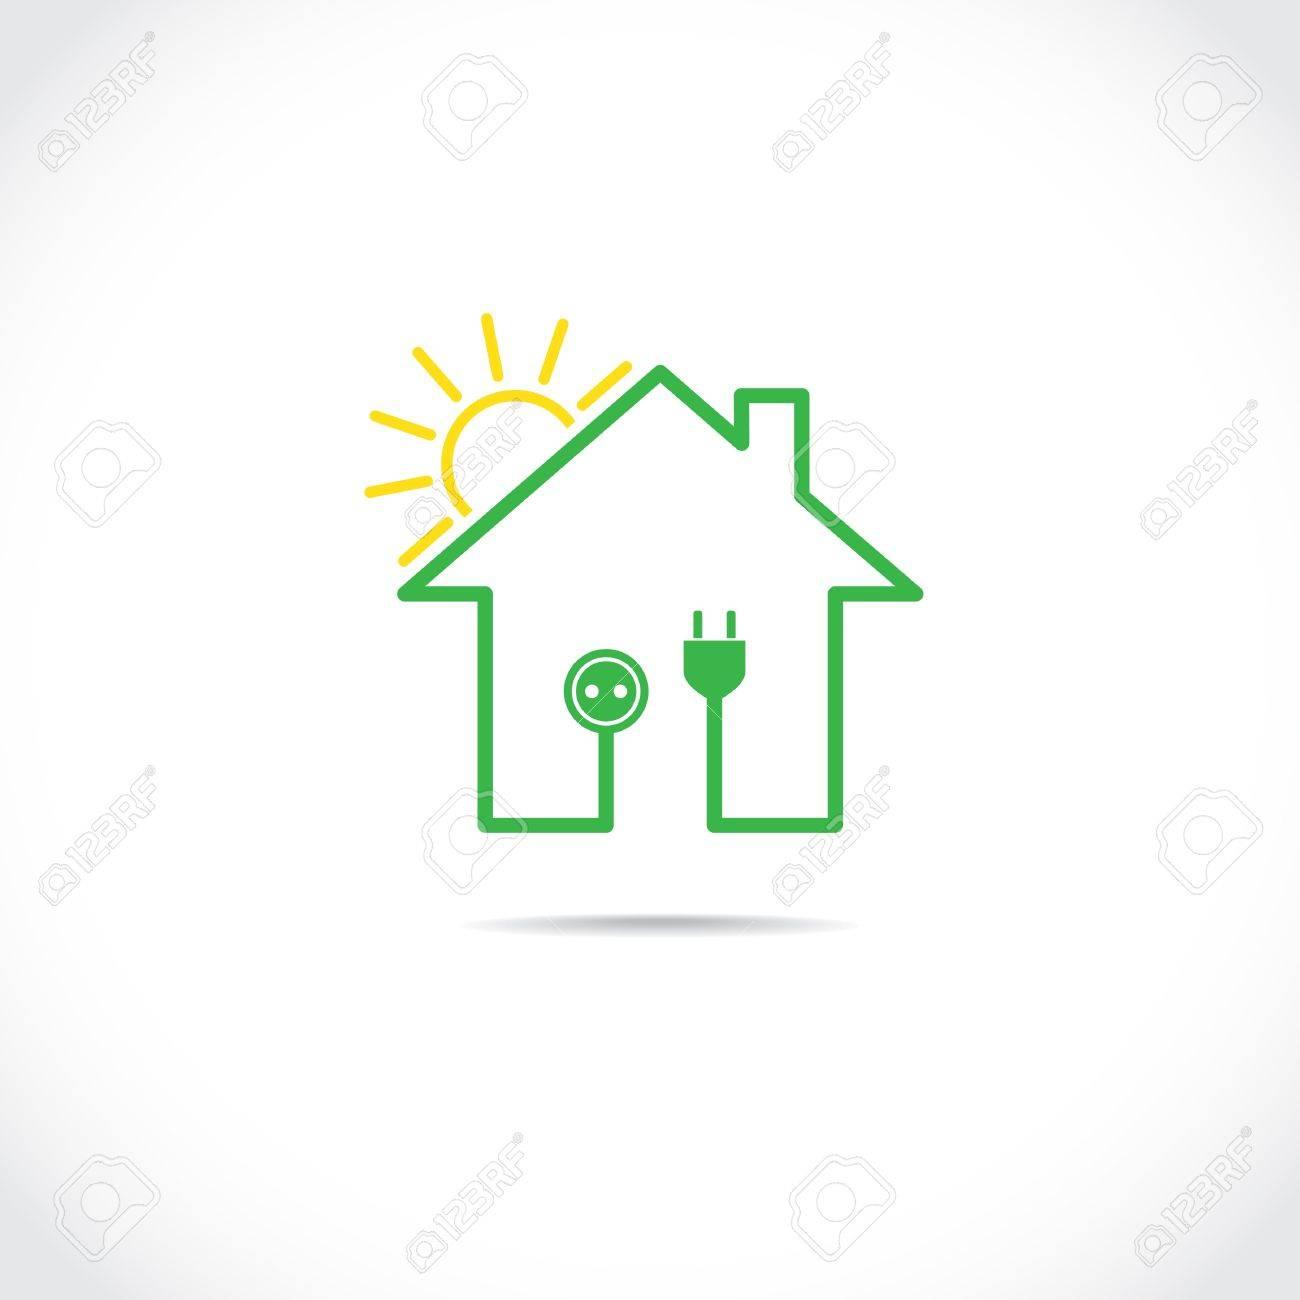 Circuito Electrico Simple : Casa símbolo como simple circuito eléctrico solar ilustración